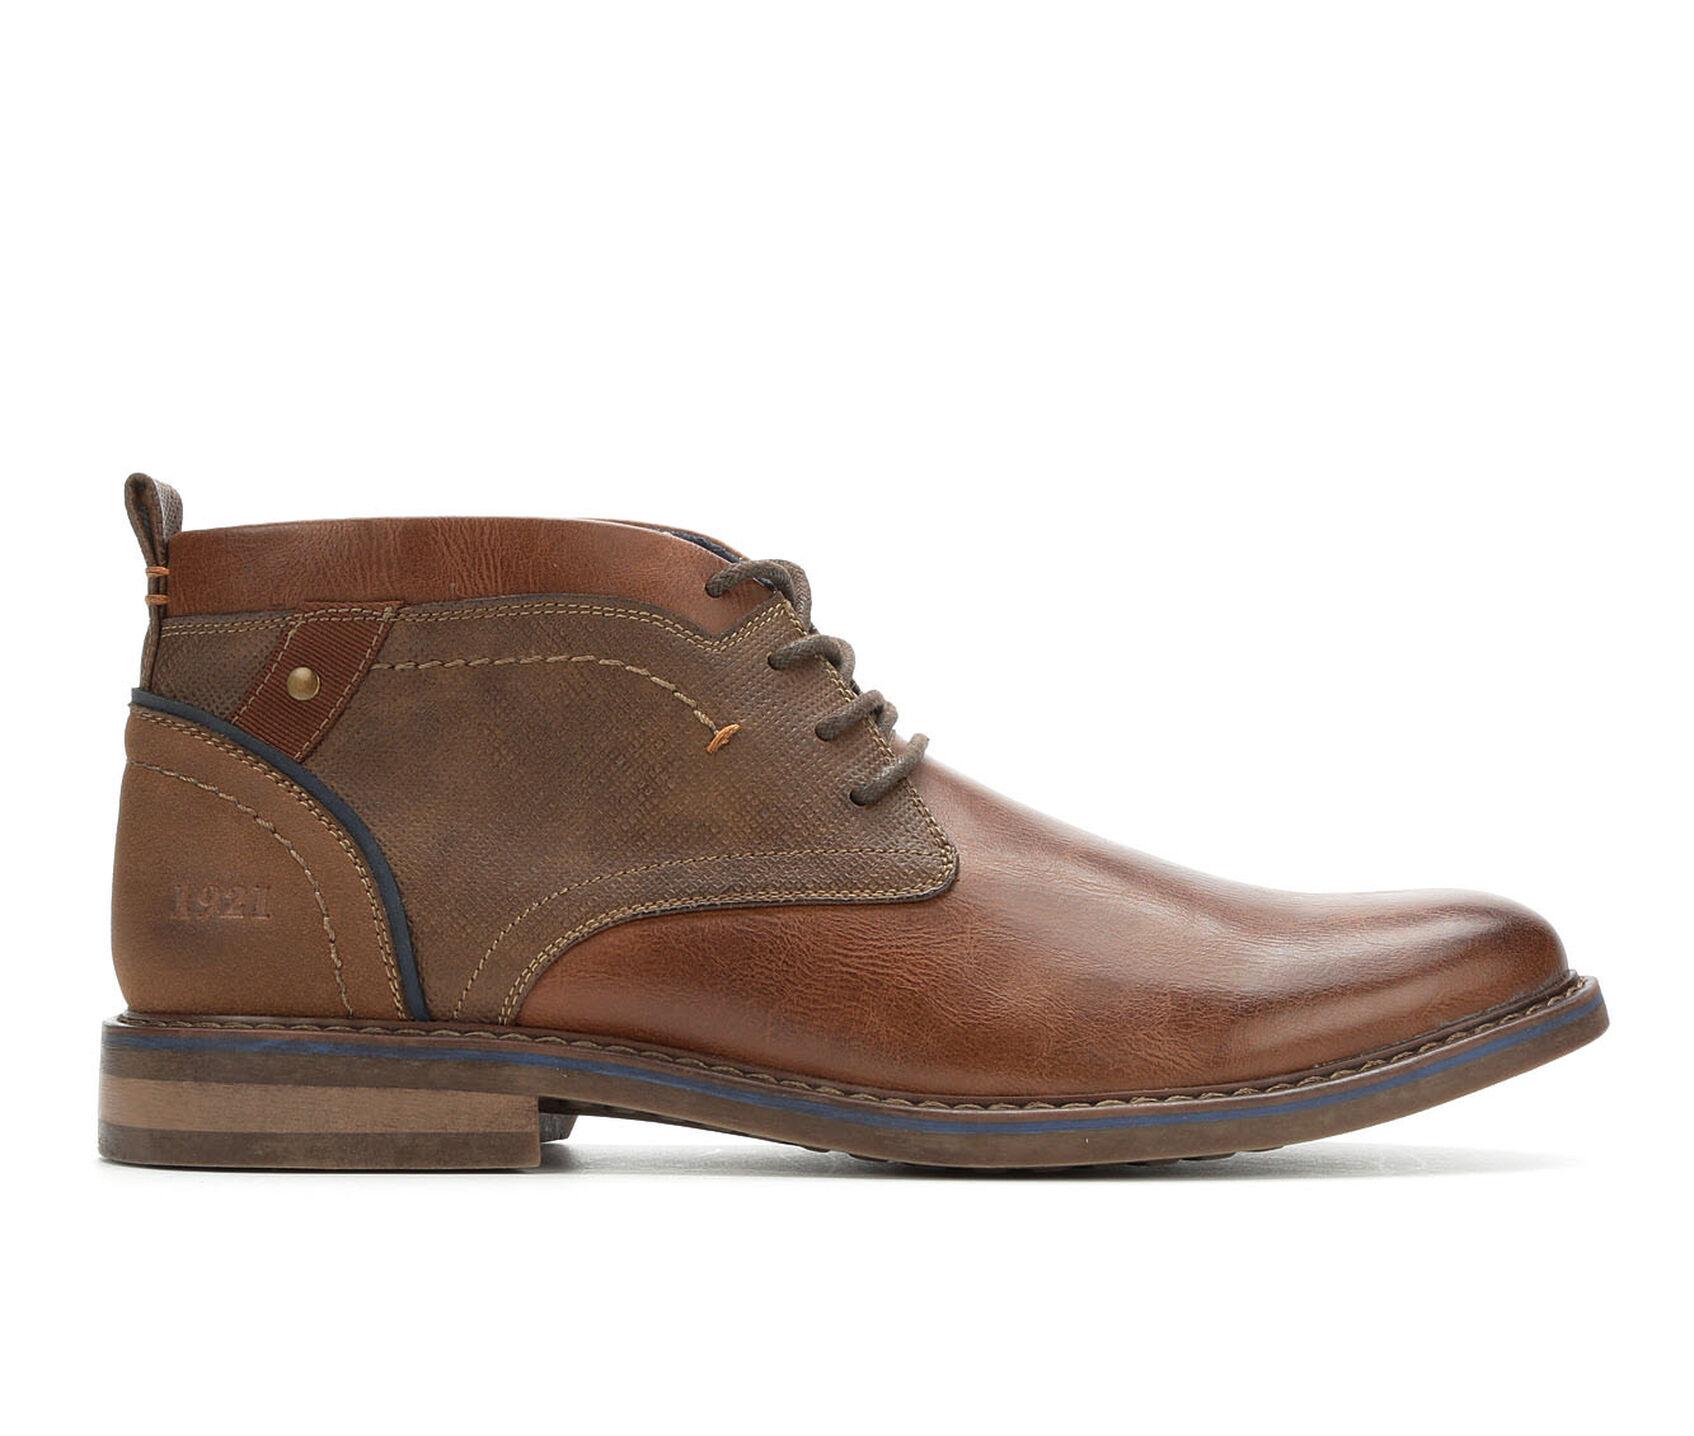 ba13c8e65f6 Men s Freeman Brent Chukka Boots